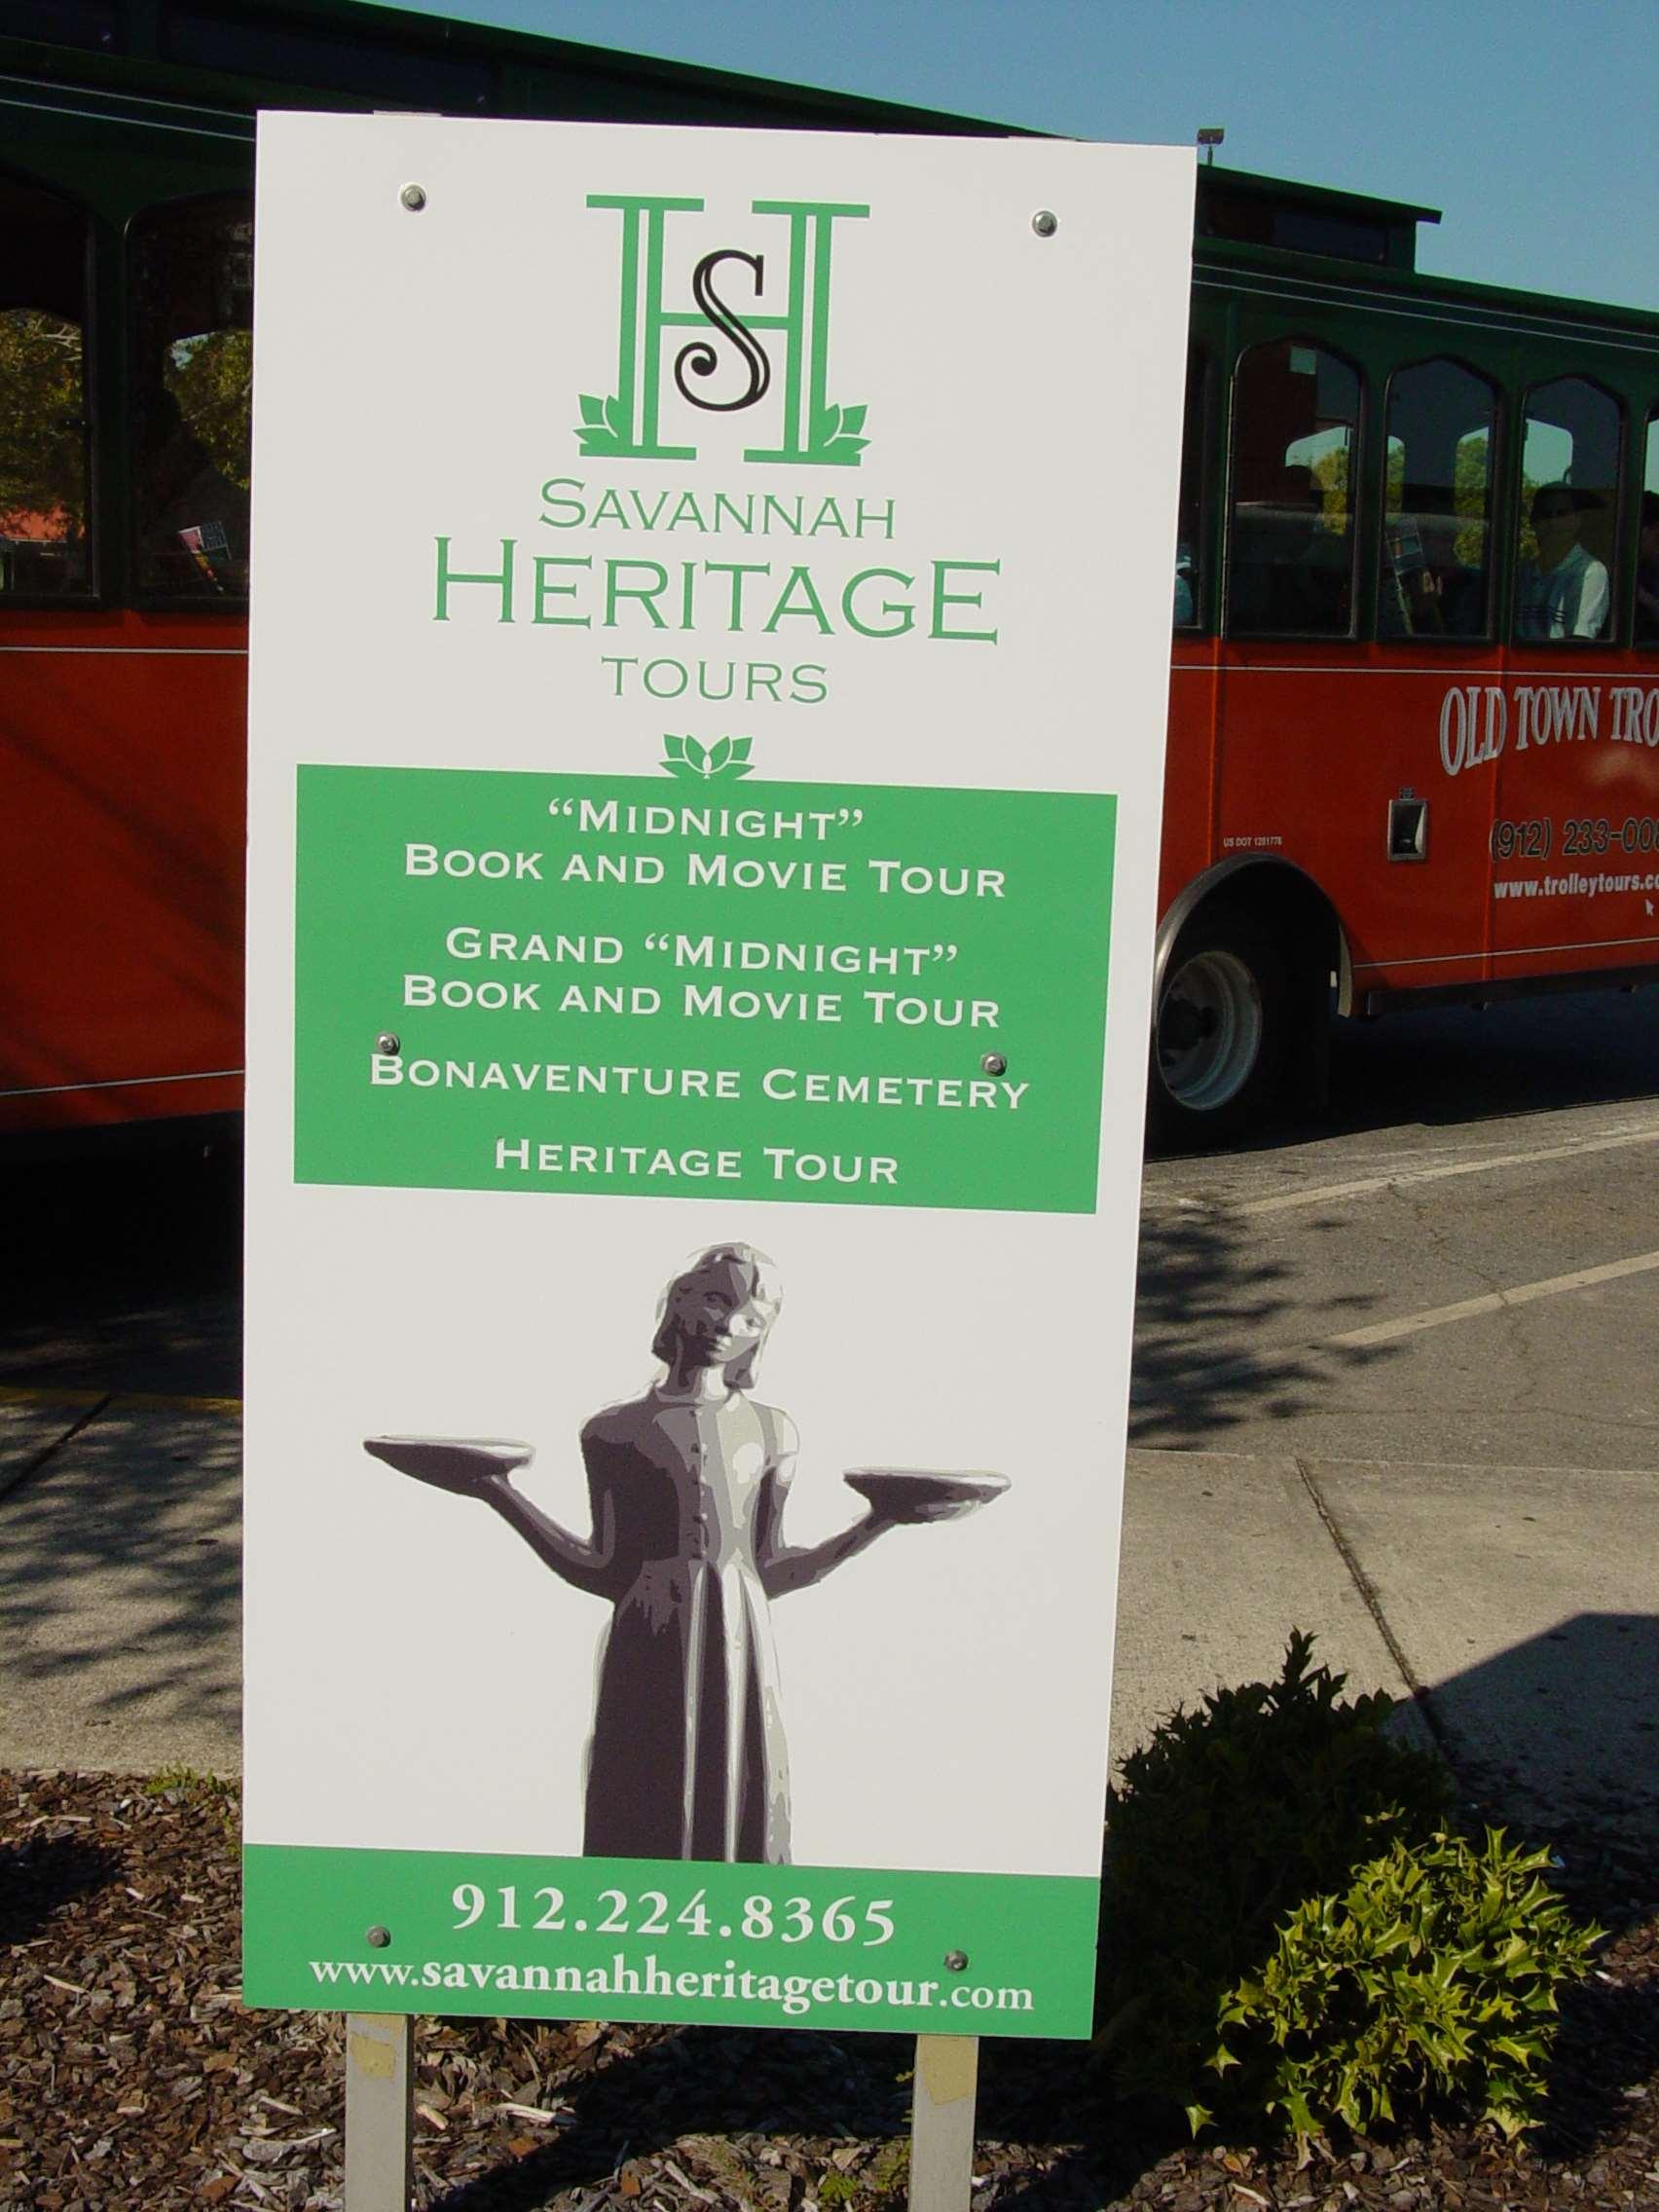 Hampton Inn & Suites Savannah Historic District image 1